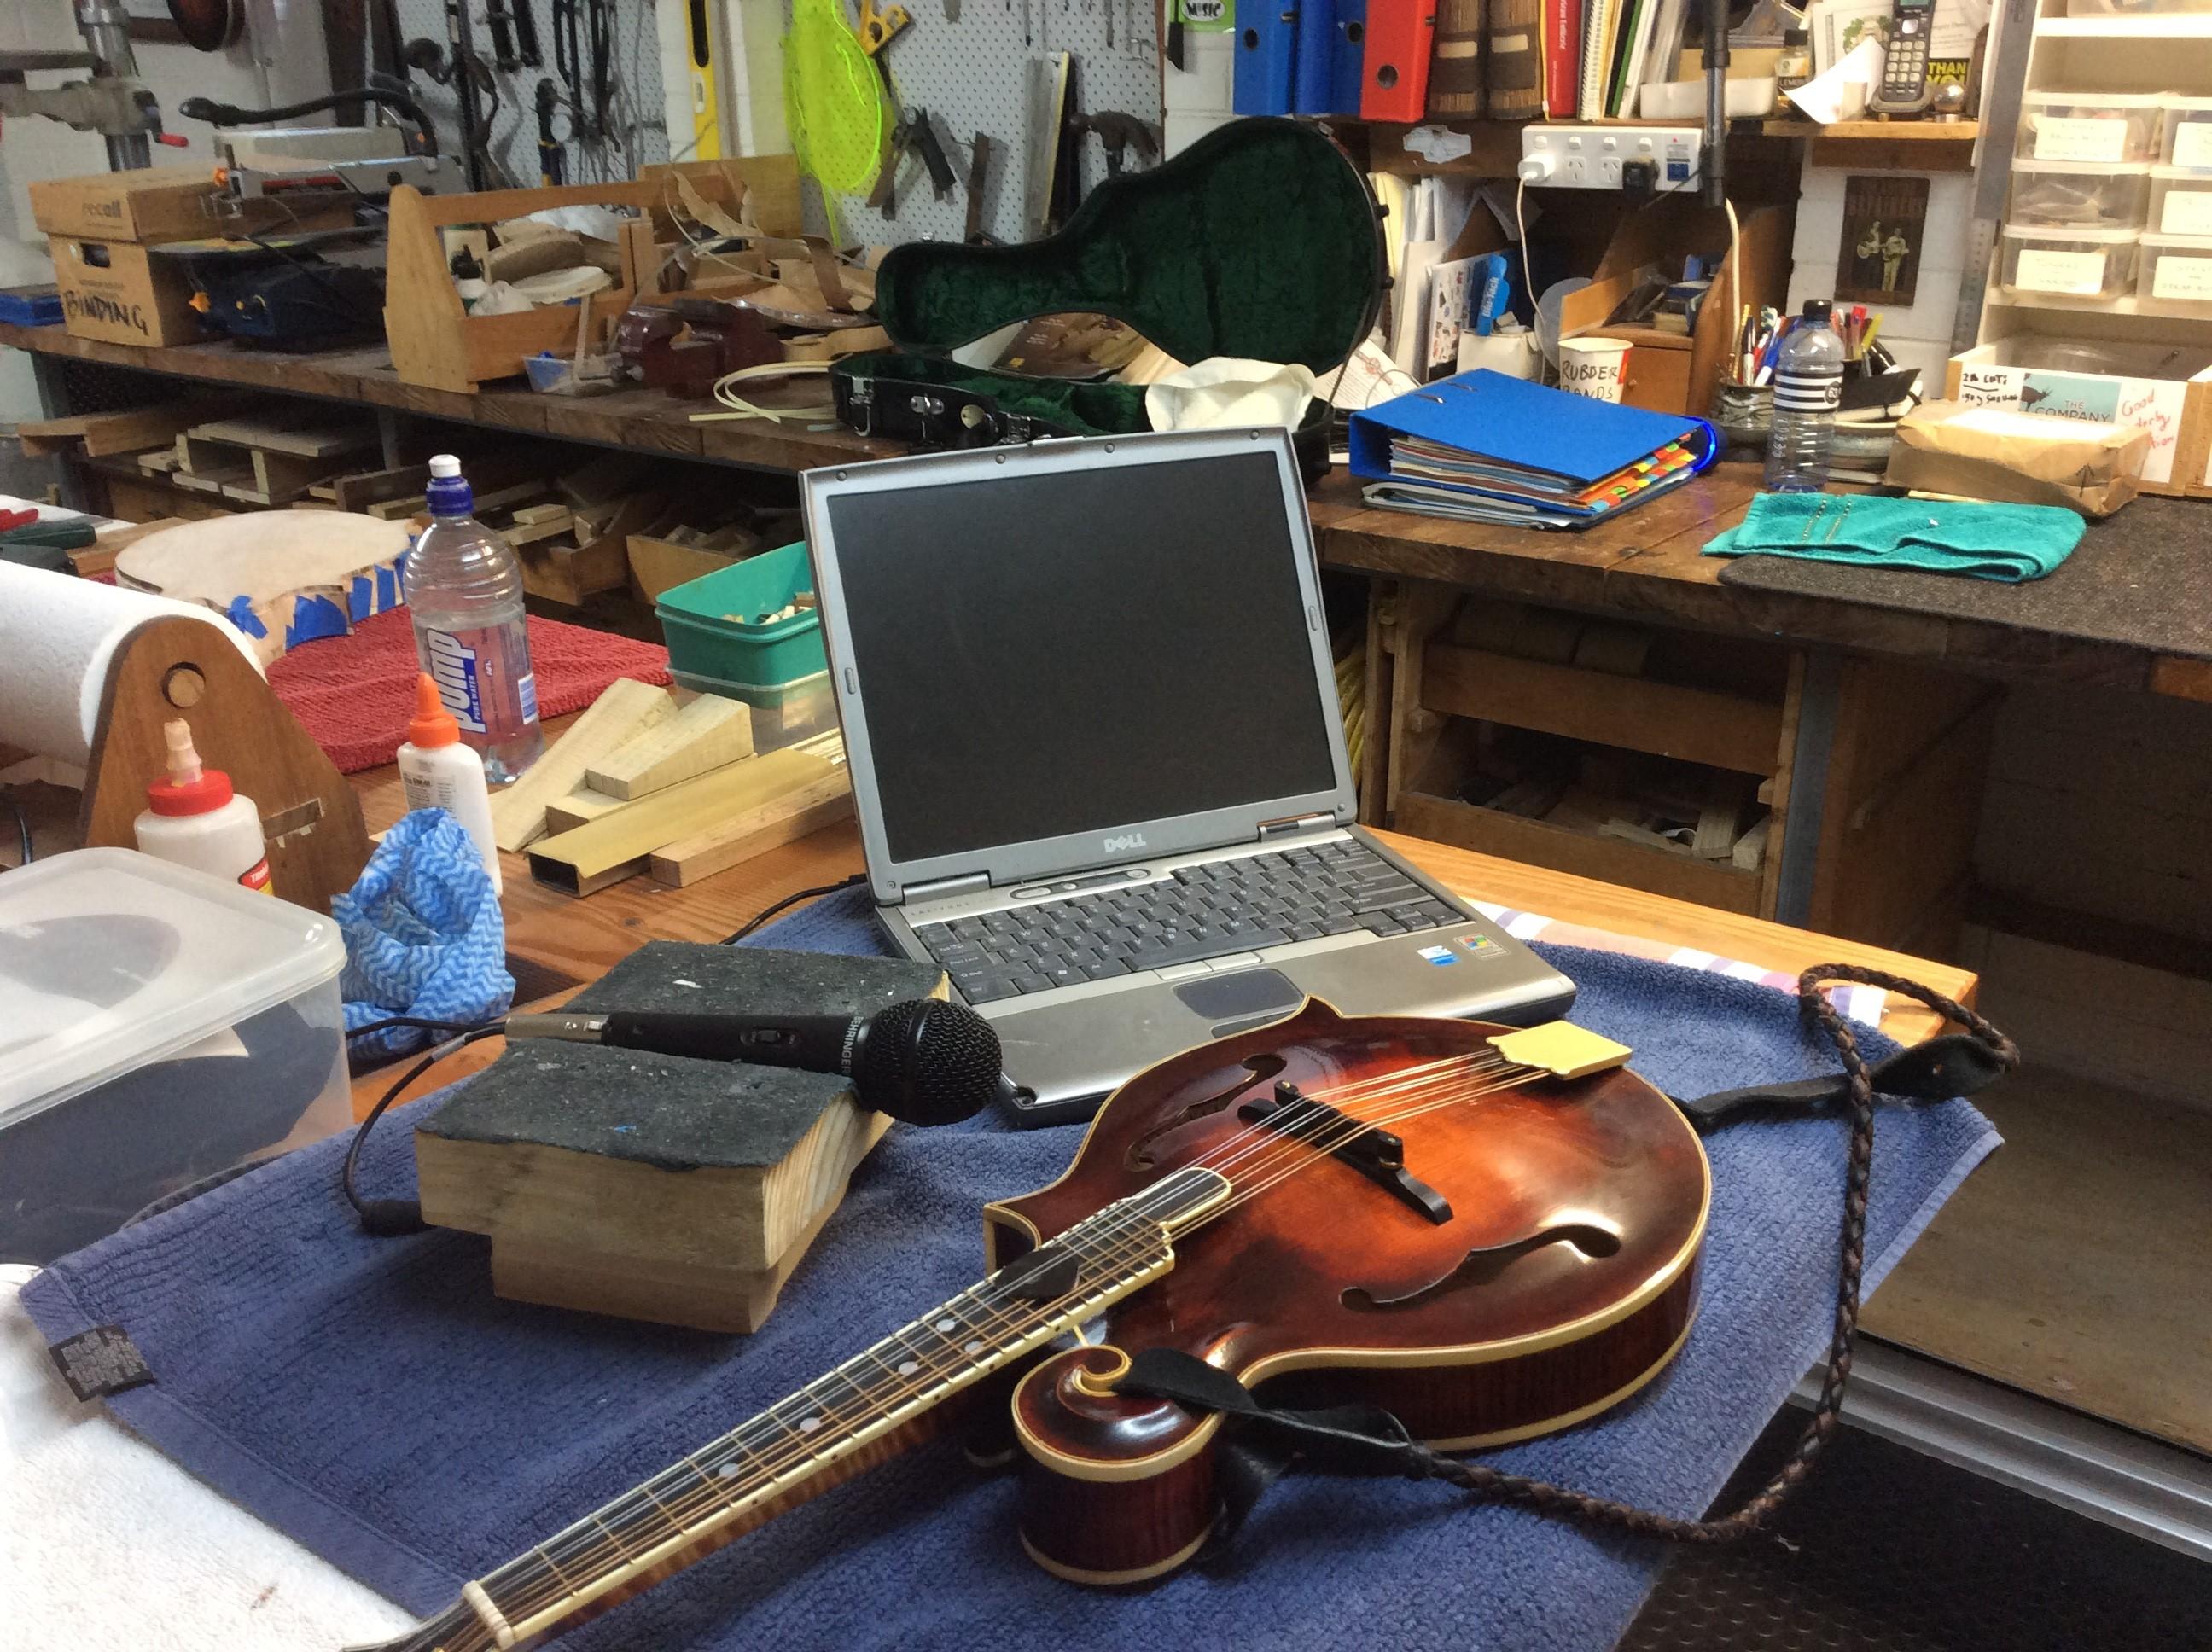 Tap tuning equipment set up